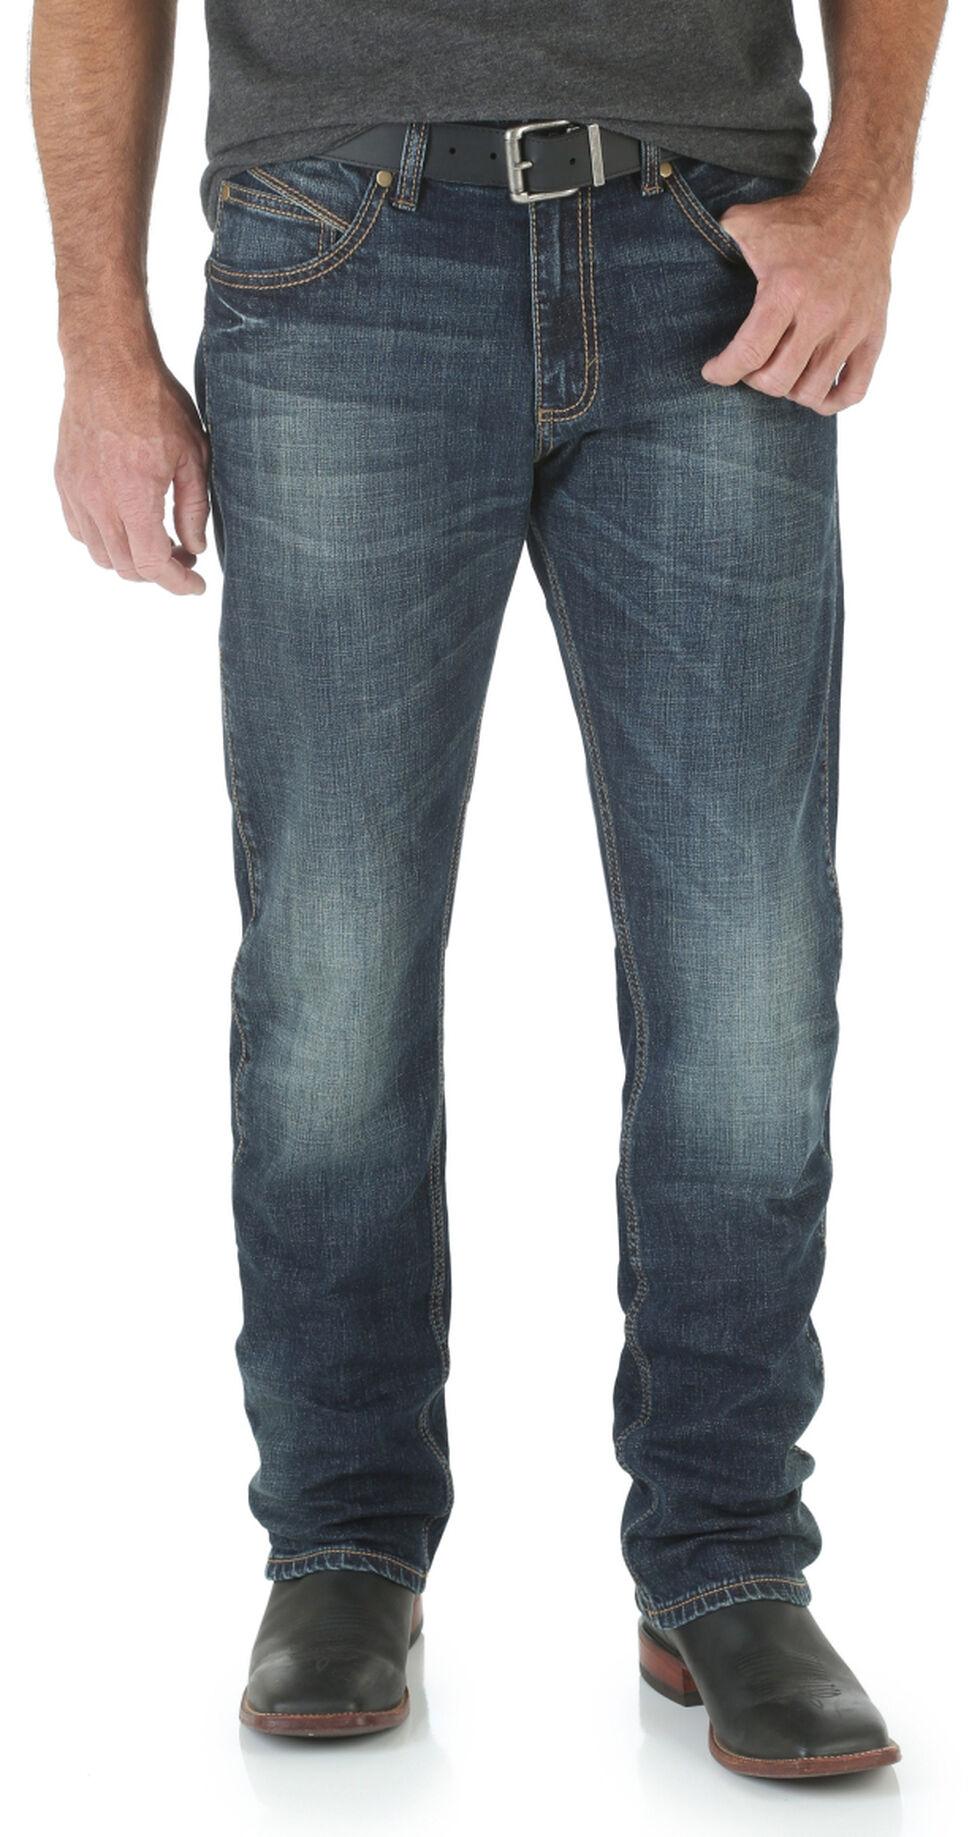 Wrangler Men's Retro Bozeman Slim Fit Straight Leg Jeans , Denim, hi-res